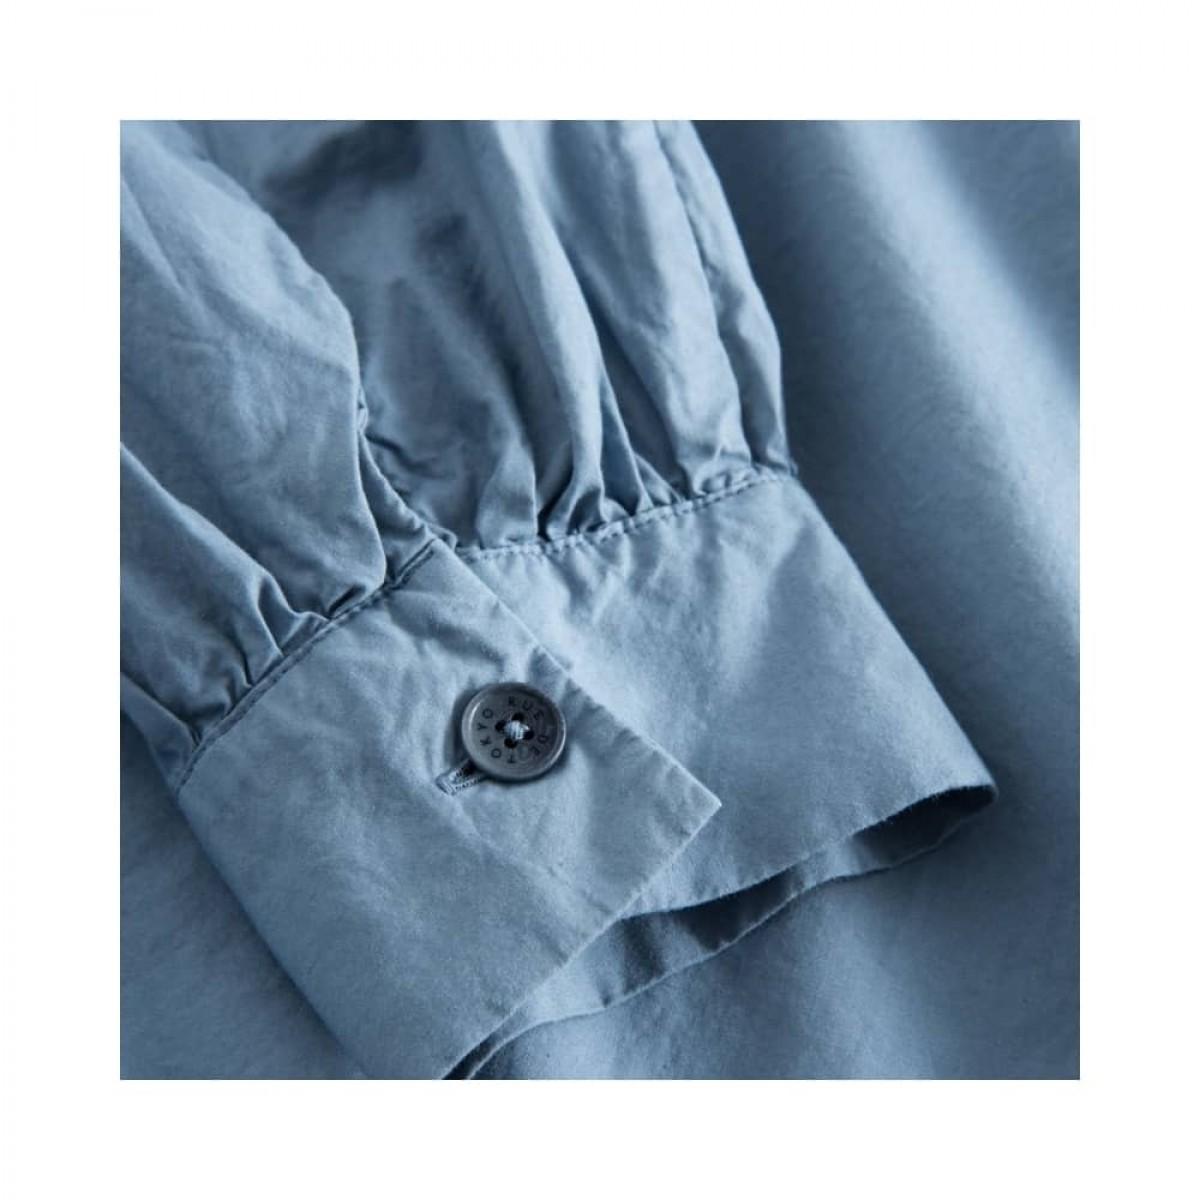 sada skjorte bluse - blue - ærme detalje